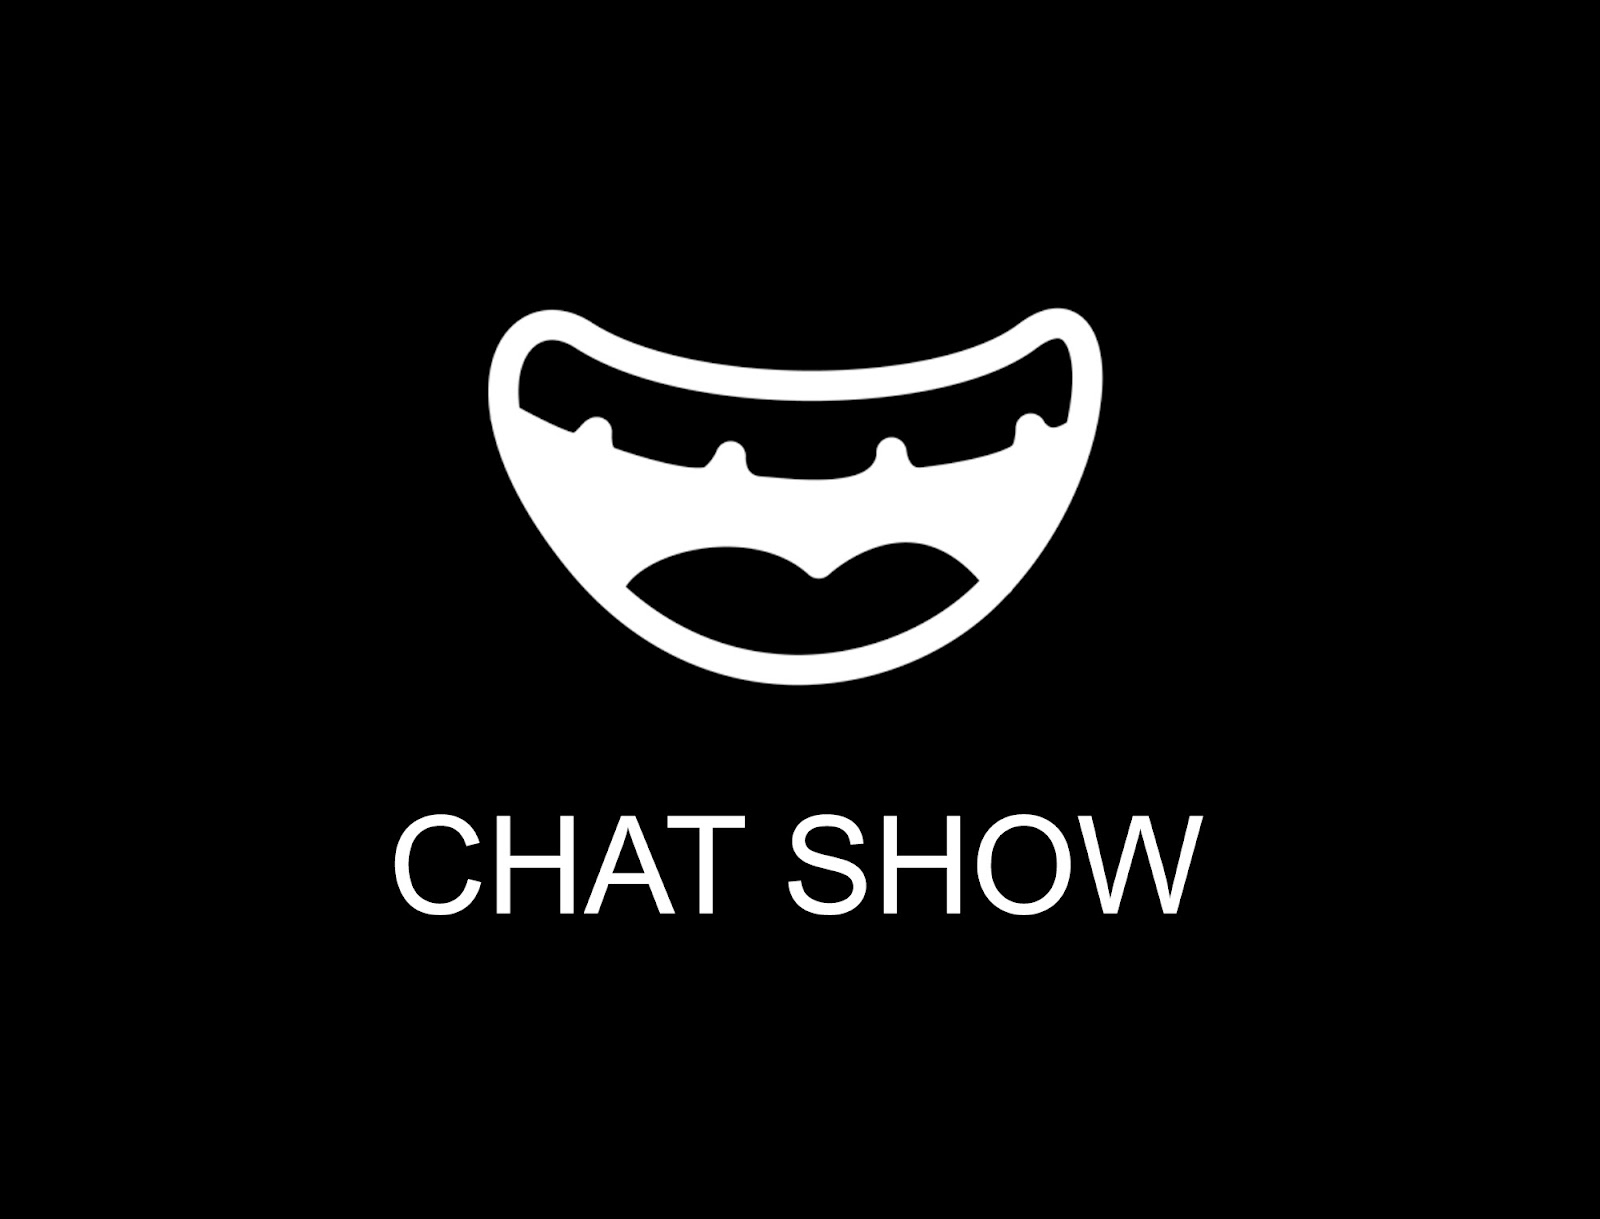 Christopher Tym (Holloran): Chatshow.